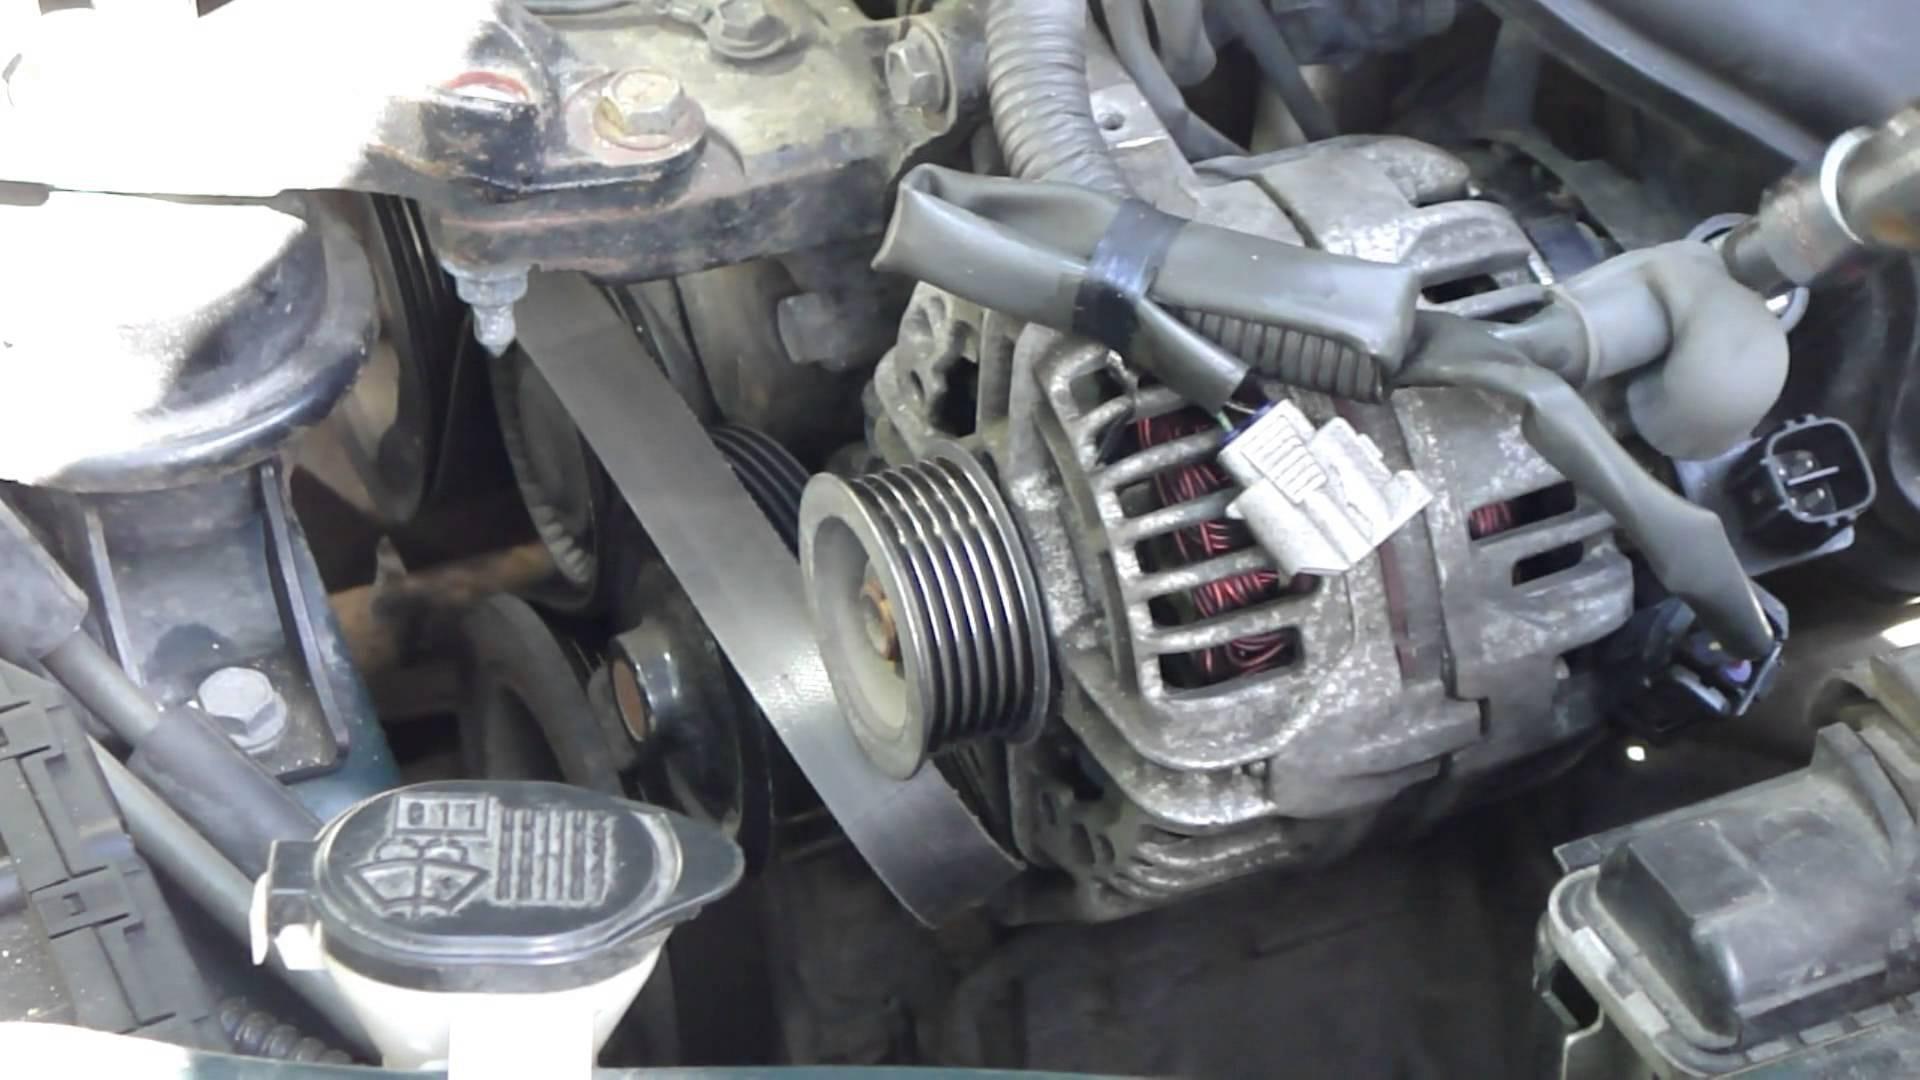 2002 Toyota Corolla Engine Diagram Amazing Celica Wiring How To Change Alternator Vvt I Years 2000